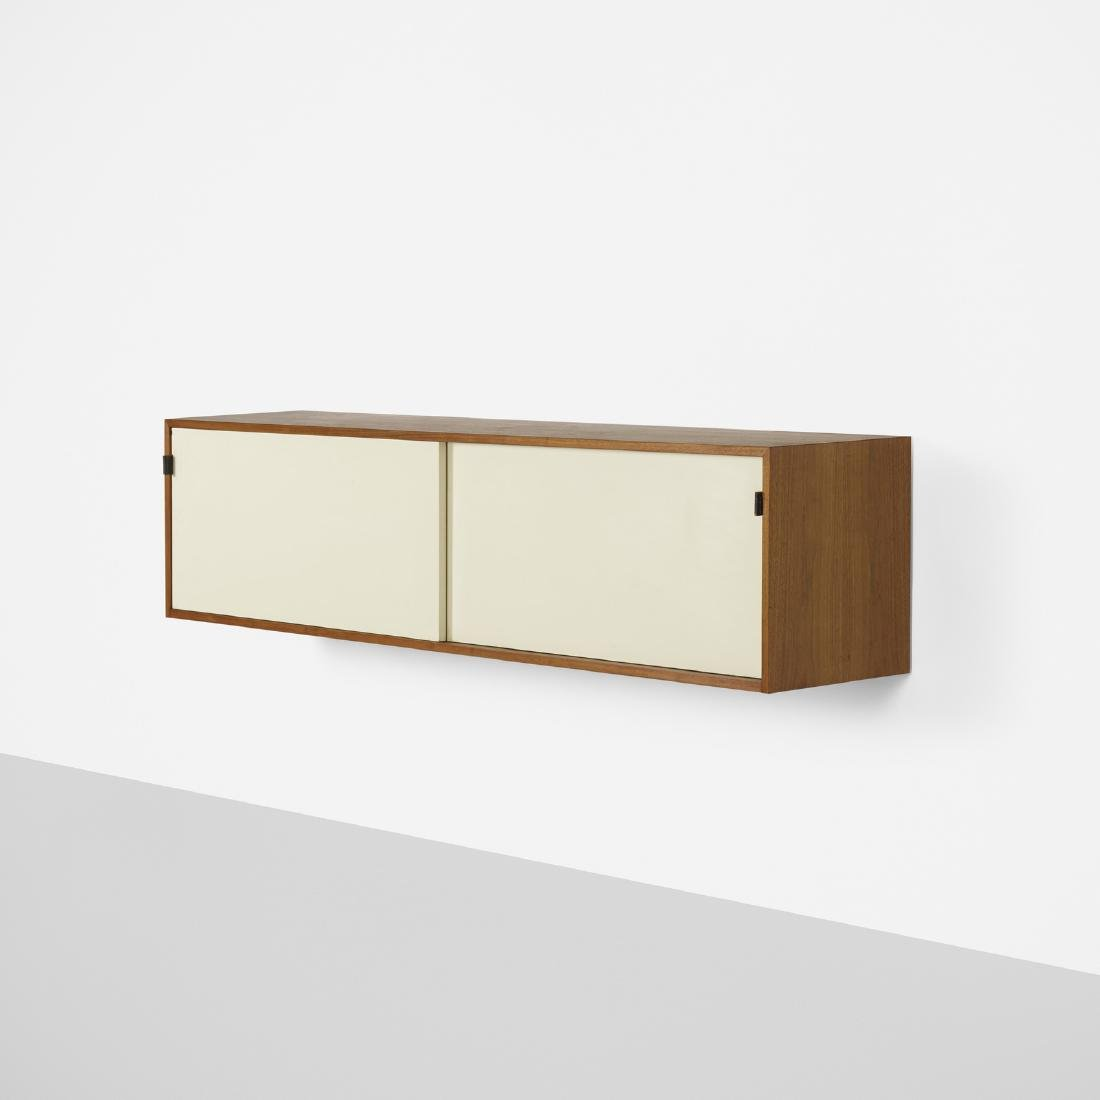 Florence Knoll, hanging cabinet, model 123